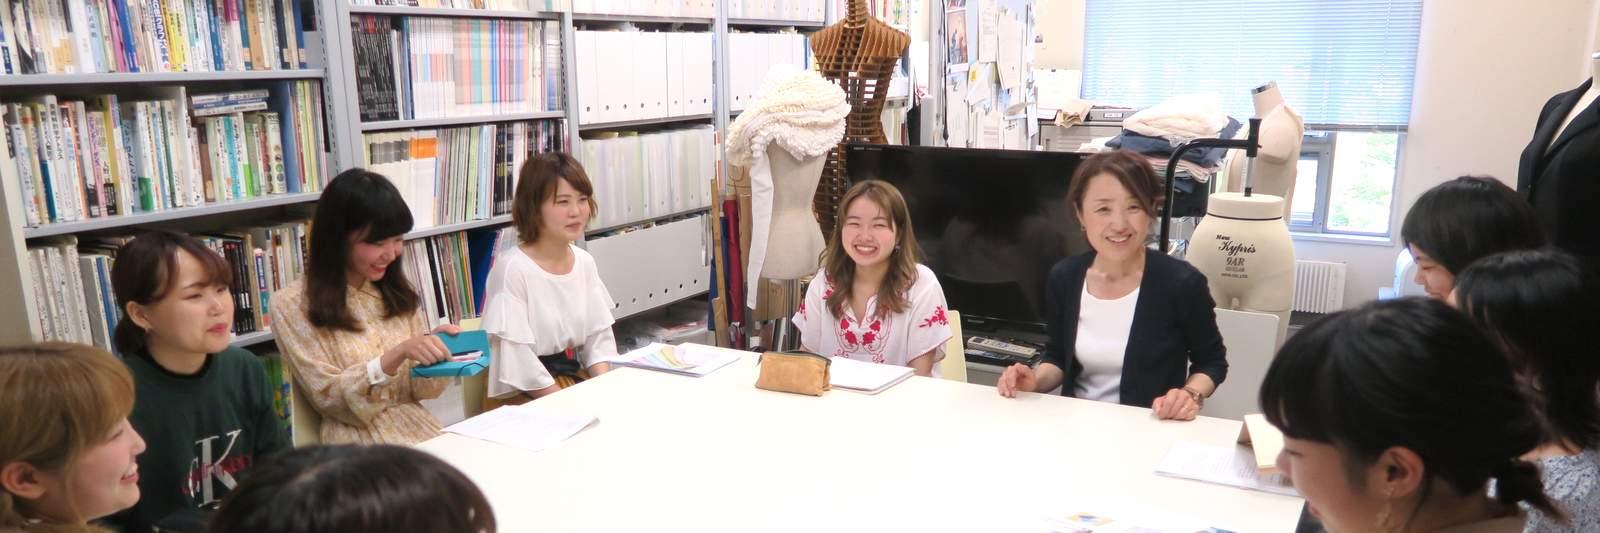 Morishita Laboratory  服飾デザイン研究室 [滋賀県立大学]